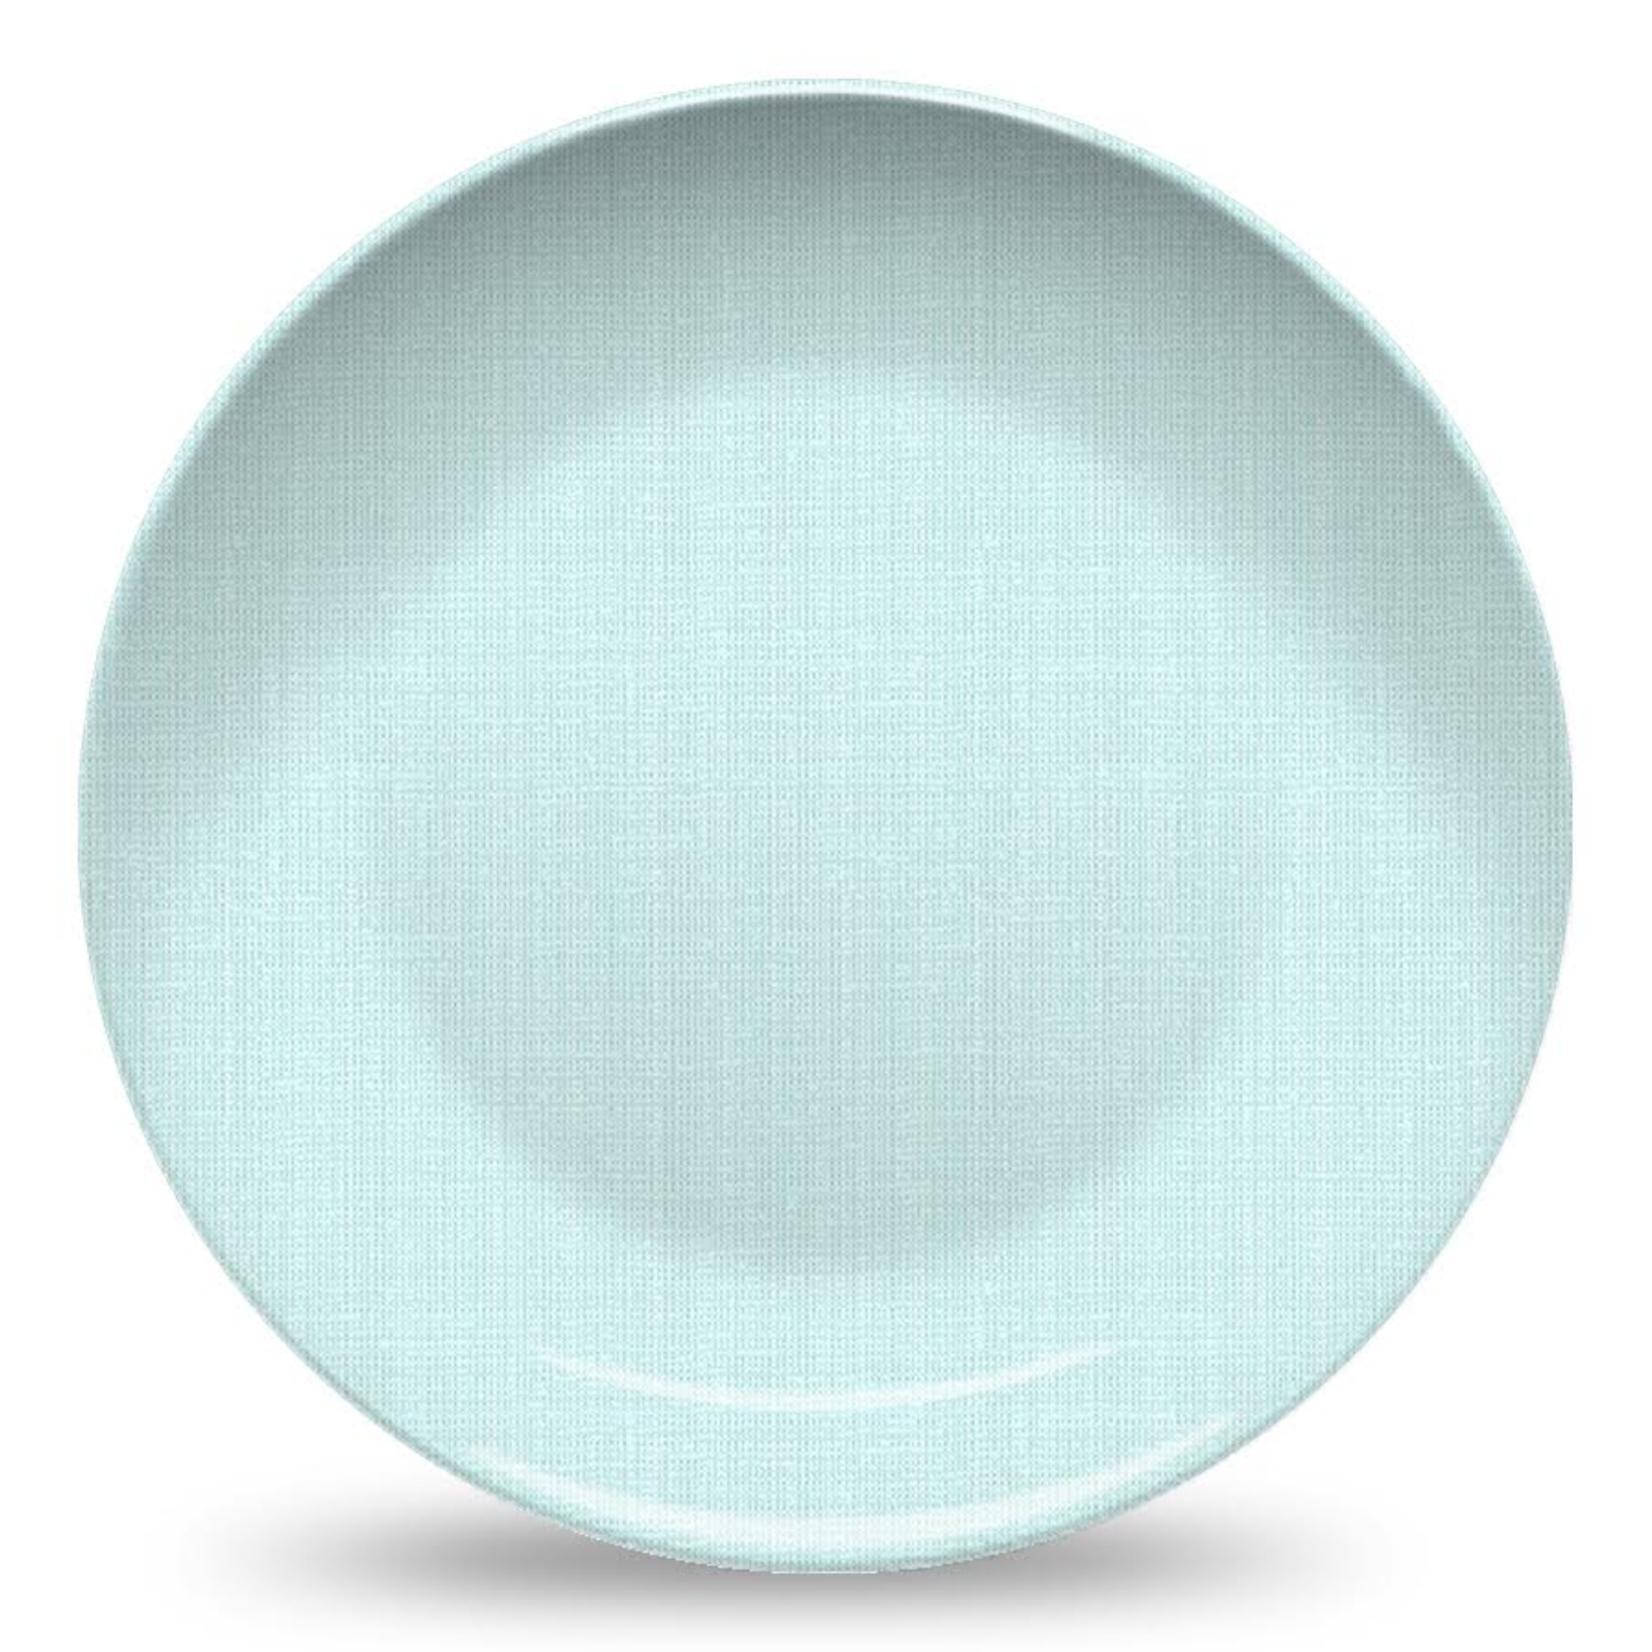 Nonna Peppy Weave Plate - Light Blue